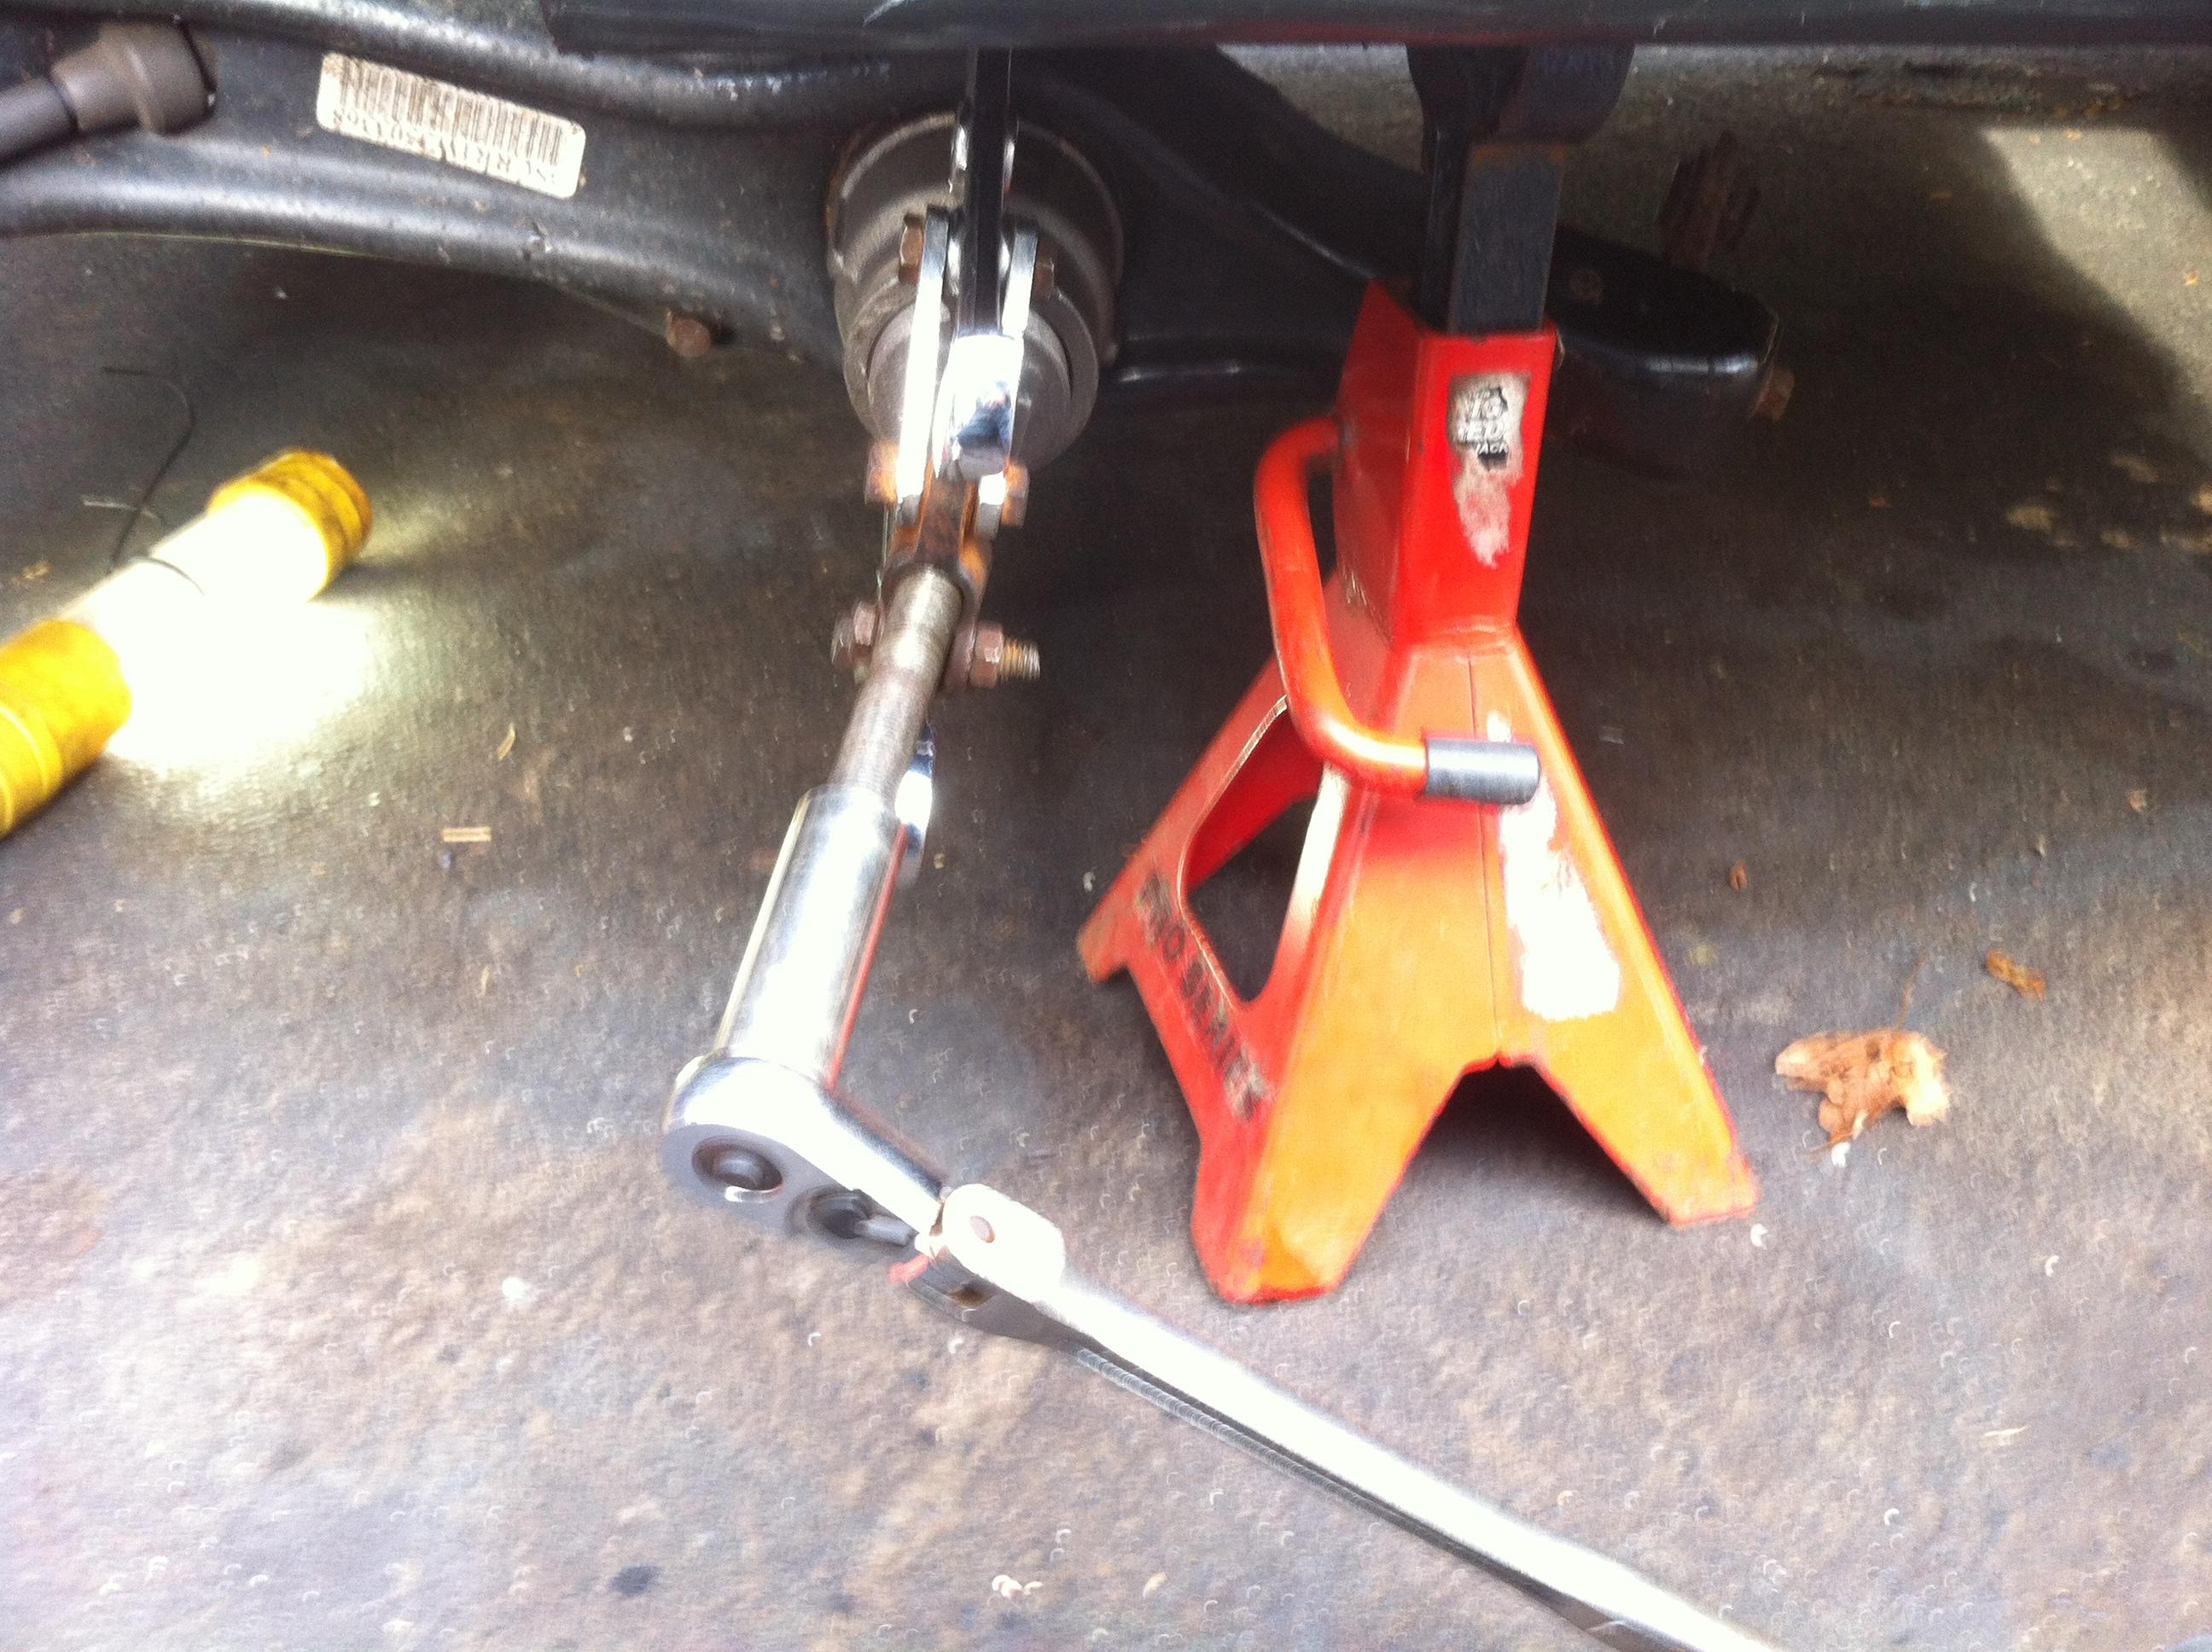 File:Honda trailing arm bushing tool hack - Pressing out the